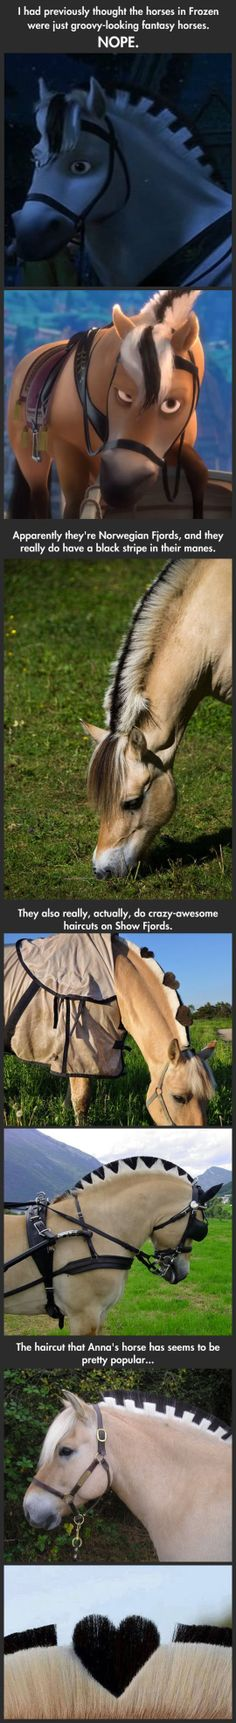 Disney horses are amazing!! #WHENYOUHAVEFJORDS